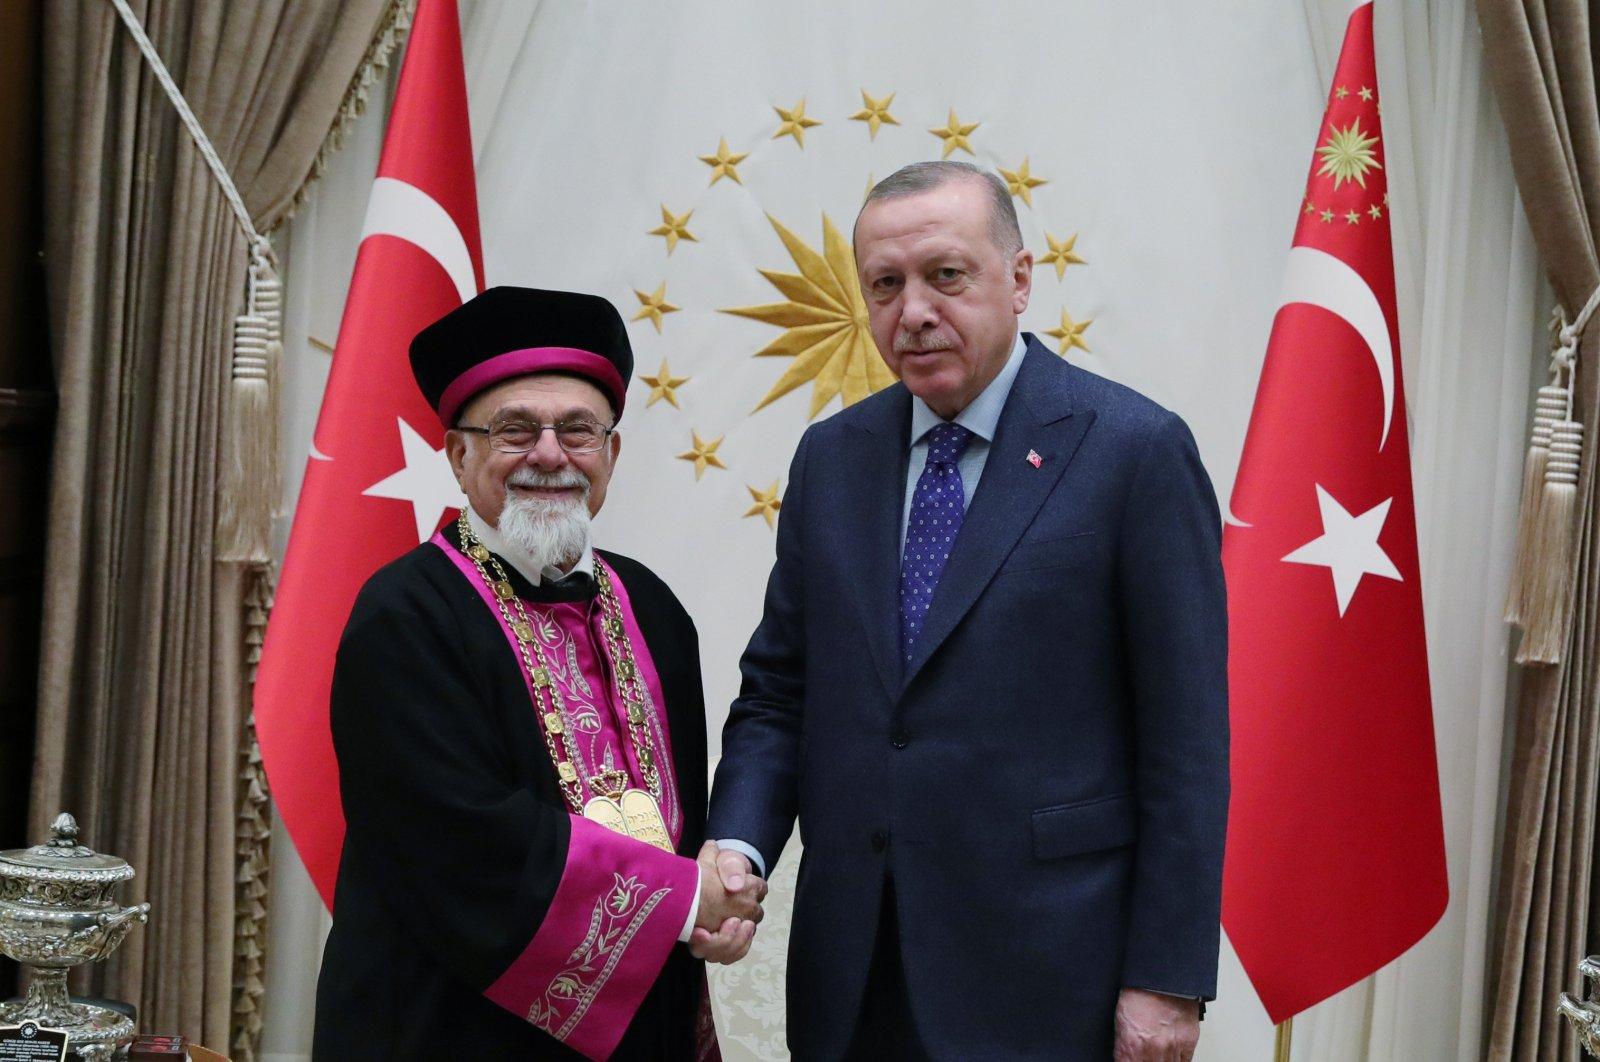 President Recep Tayyip Erdoğan shakes hands with Ishak Haleva, chief rabbi of the Jewish community in Turkey at the Presidential Complex in Ankara, Turkey, Jan. 31, 2020. (AA File Photo)